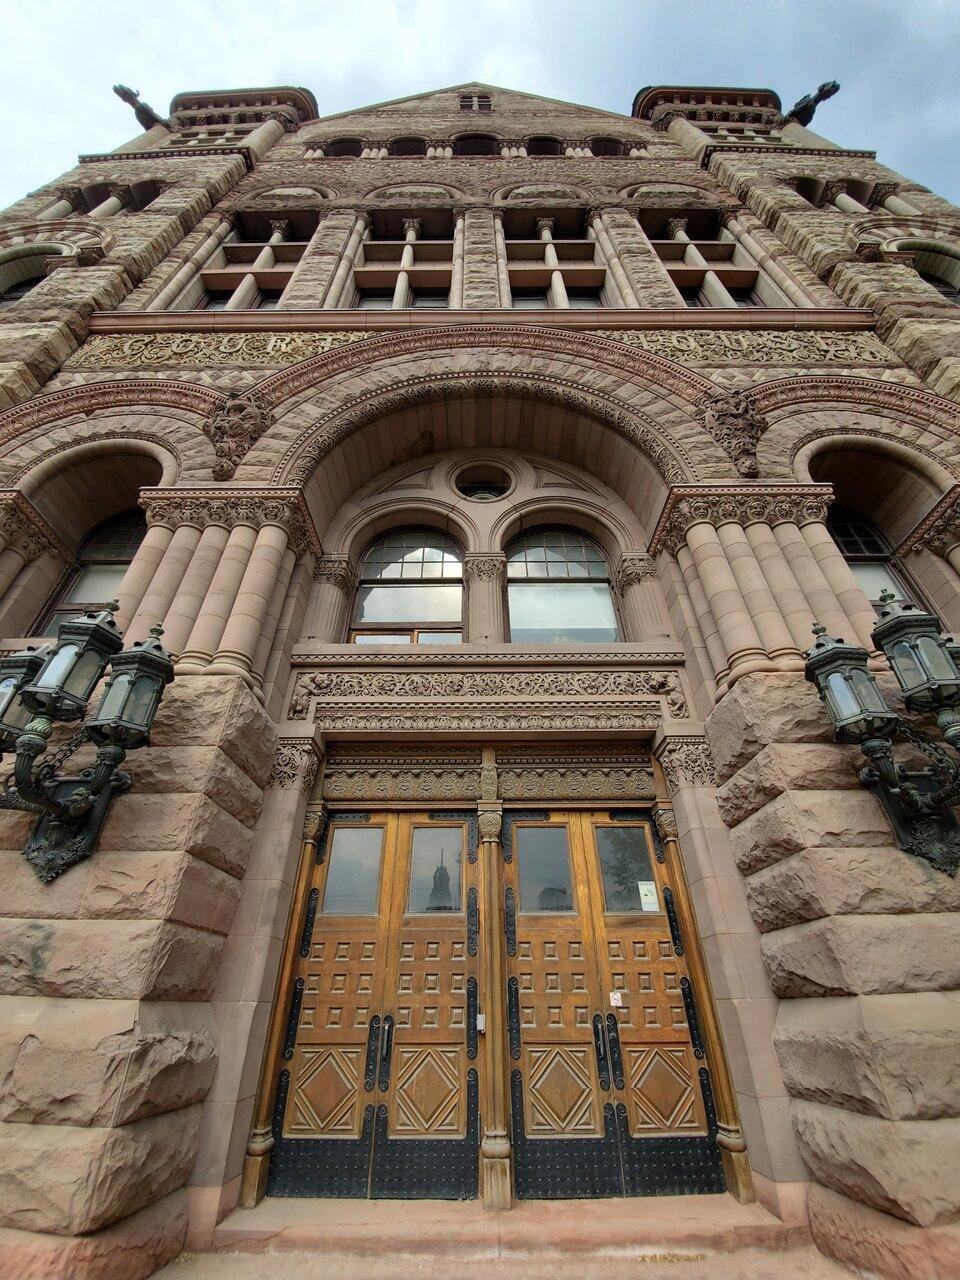 Daily Photo, Toronto, Old City Hall